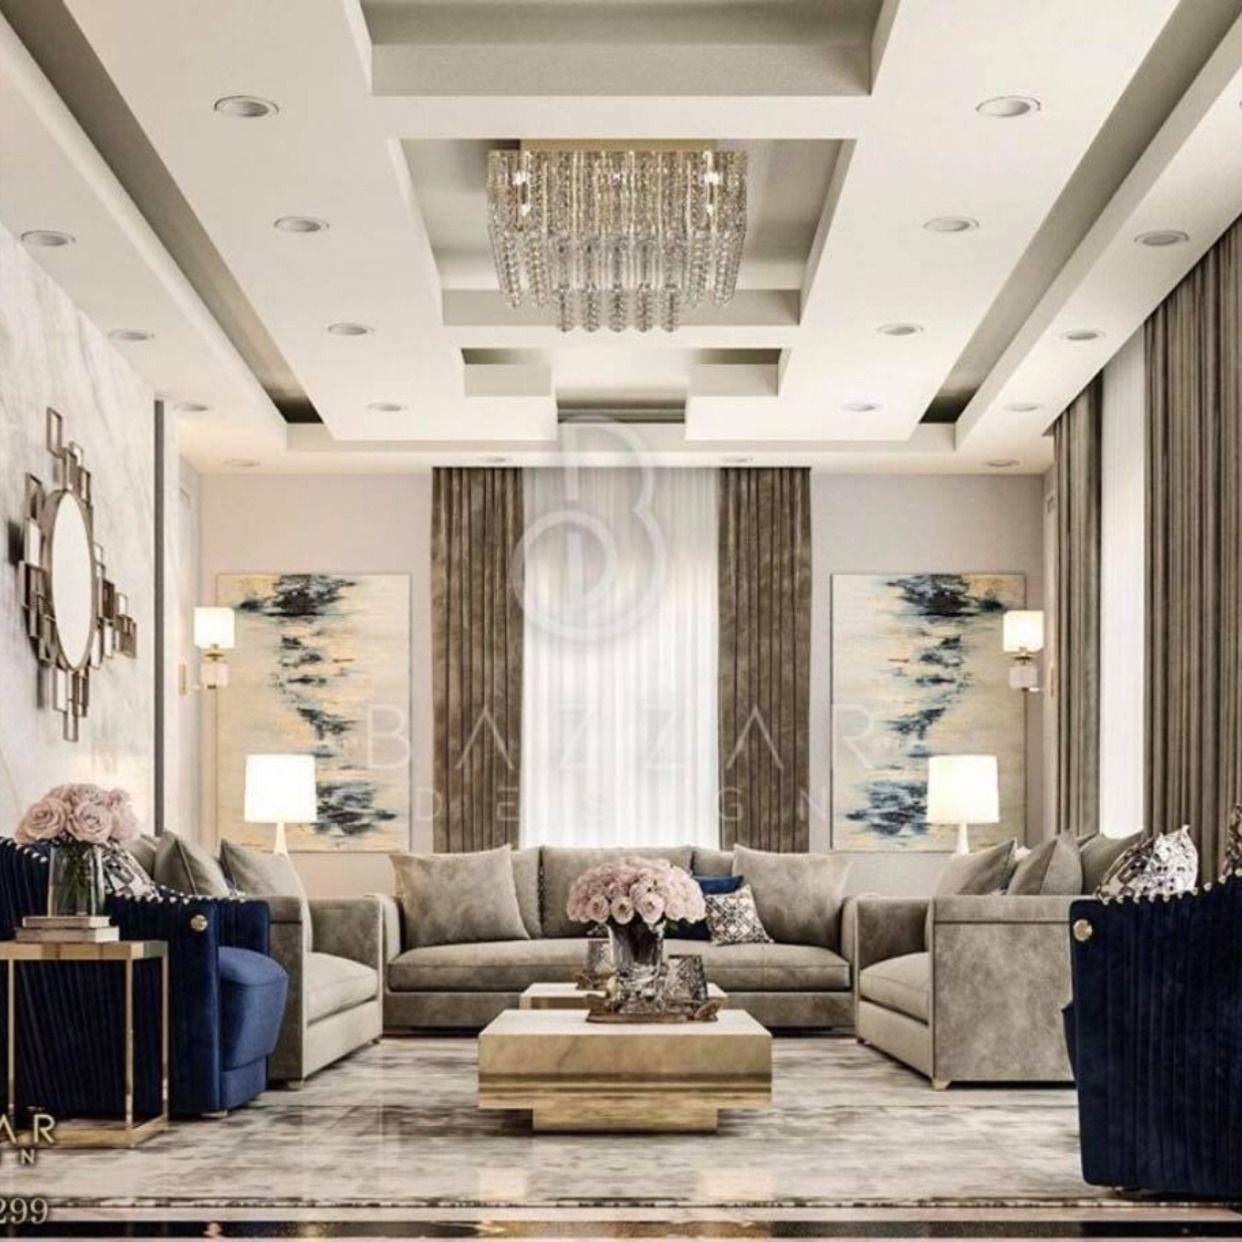 10 Ideas For Living Room Design Living Room Designs Cozy Living Room Design Living Room Design Modern